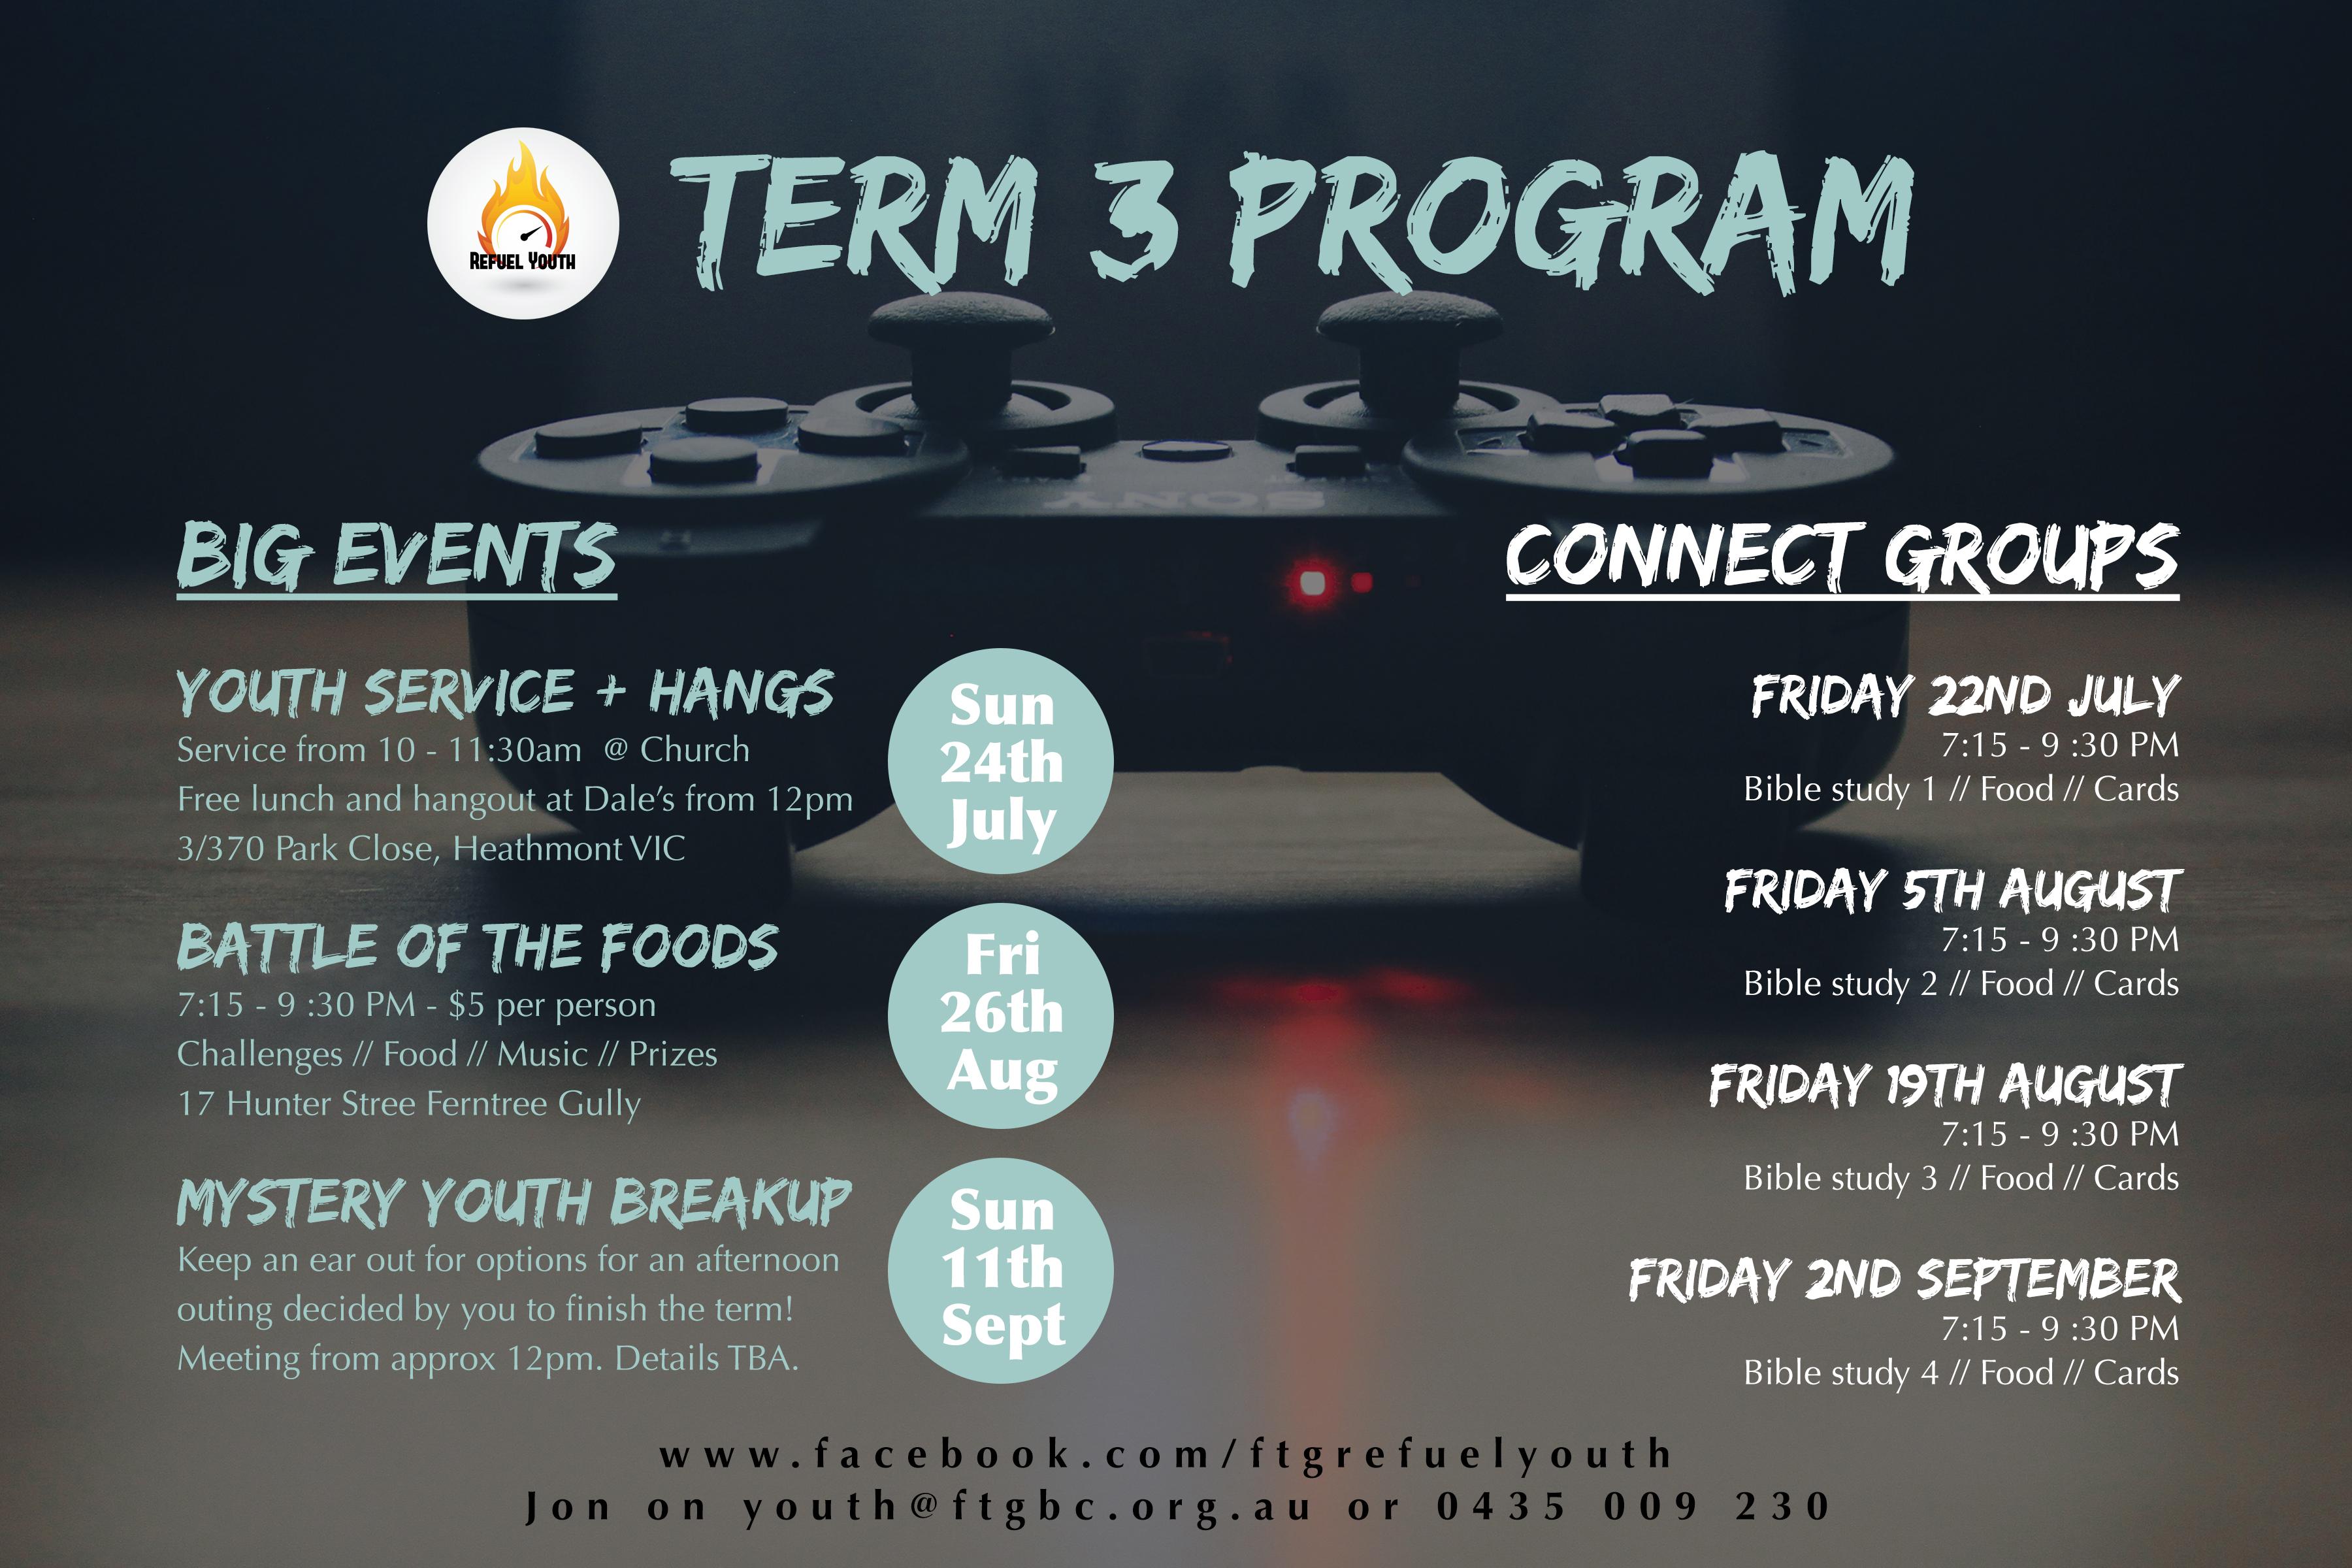 Term 3 Program